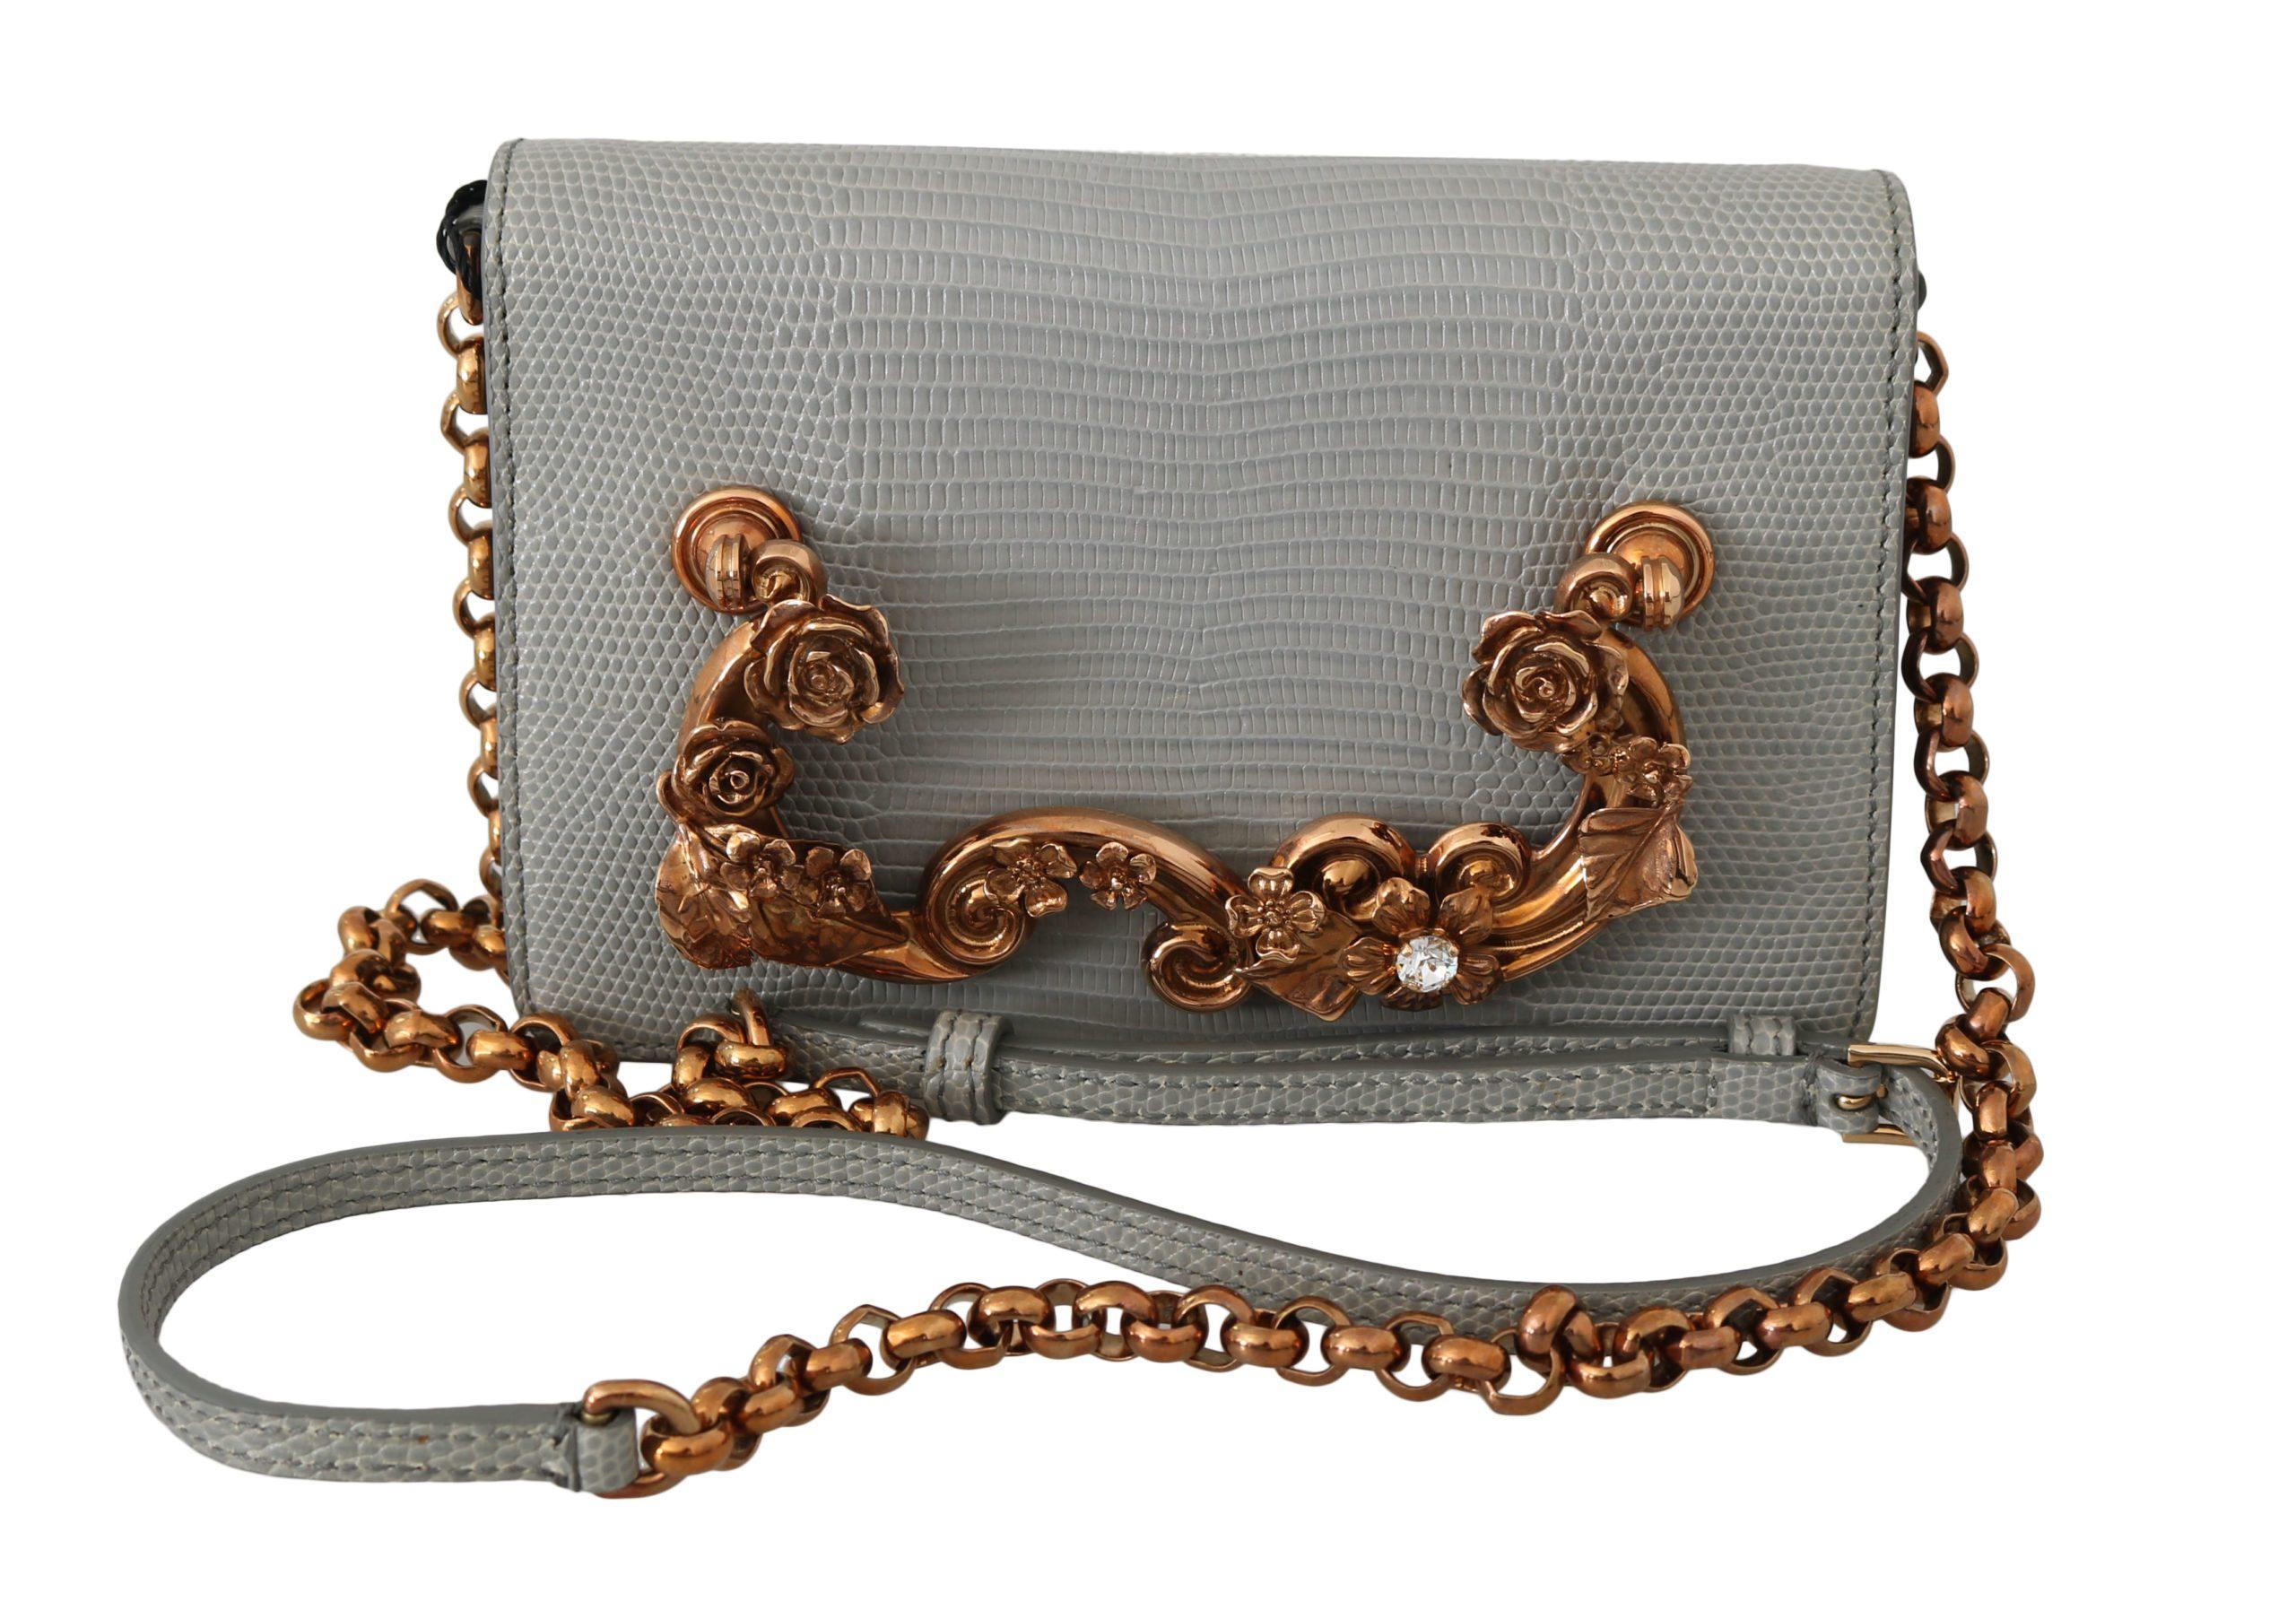 Dolce & Gabbana Women's Lizard Skin Crystal Leather Crossbody Bag Gray VAS8684